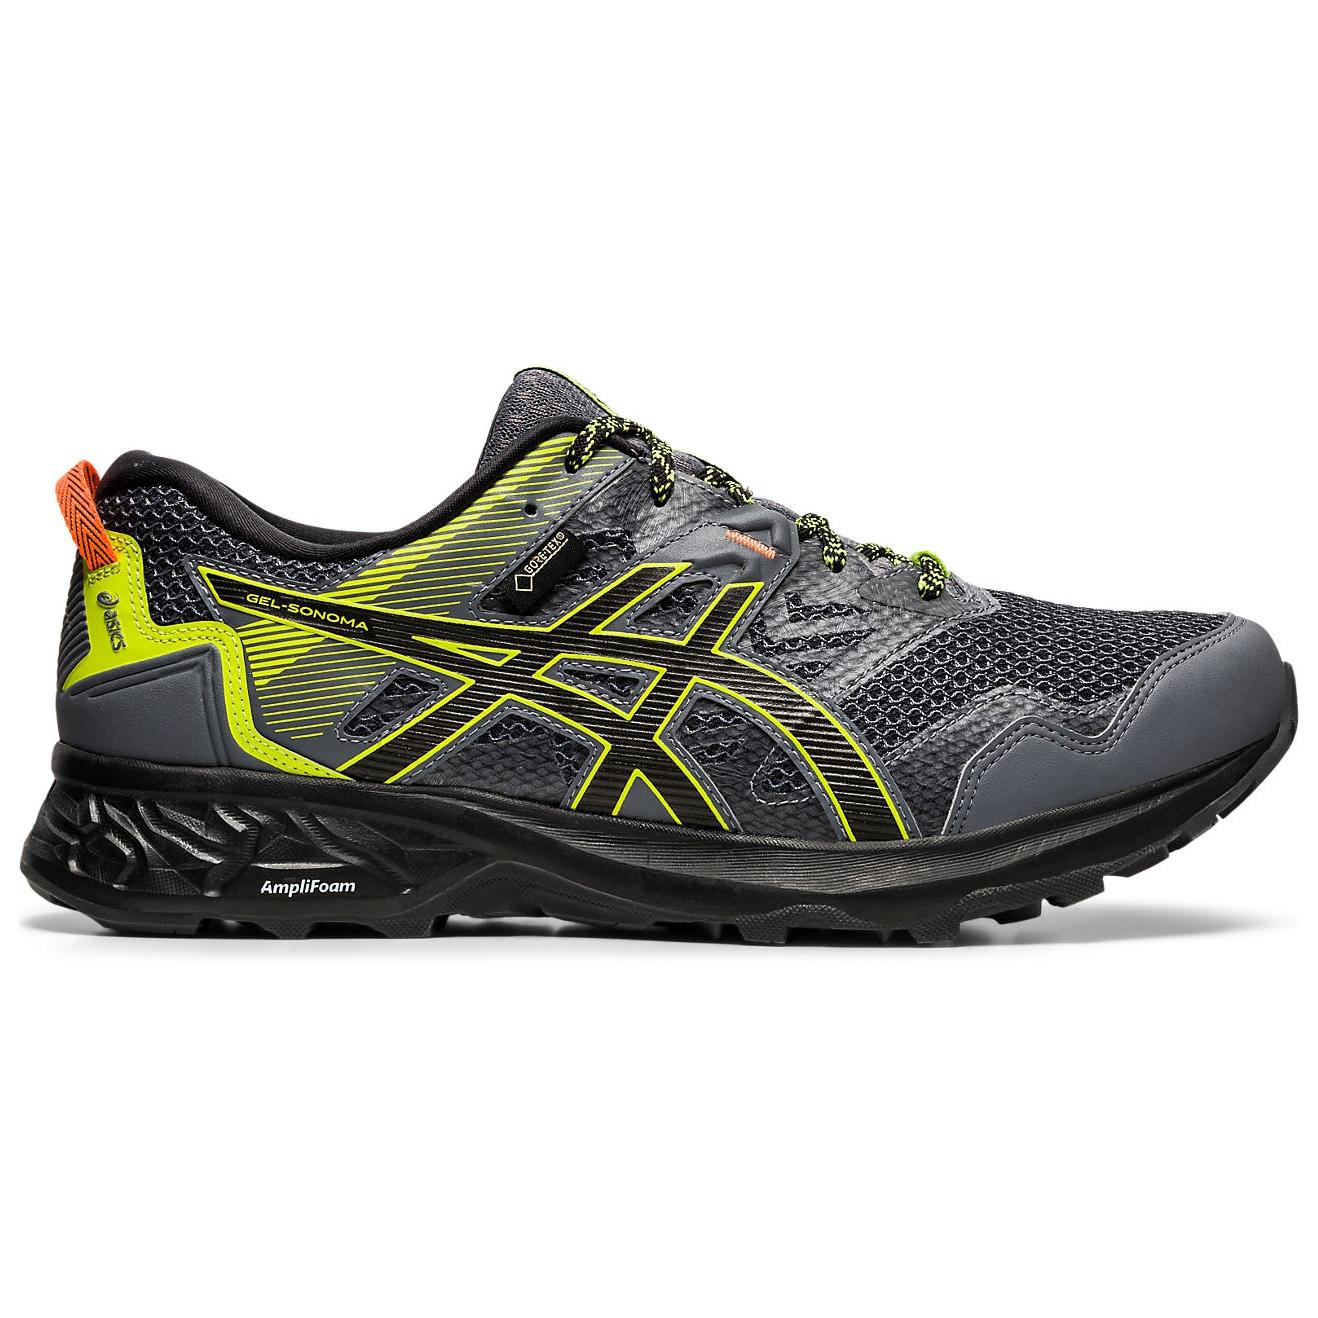 Estadístico Robusto Estéril  Asics Gel-Sonoma 5 GTX - Trail running shoes Men's | Free EU Delivery |  Bergfreunde.eu